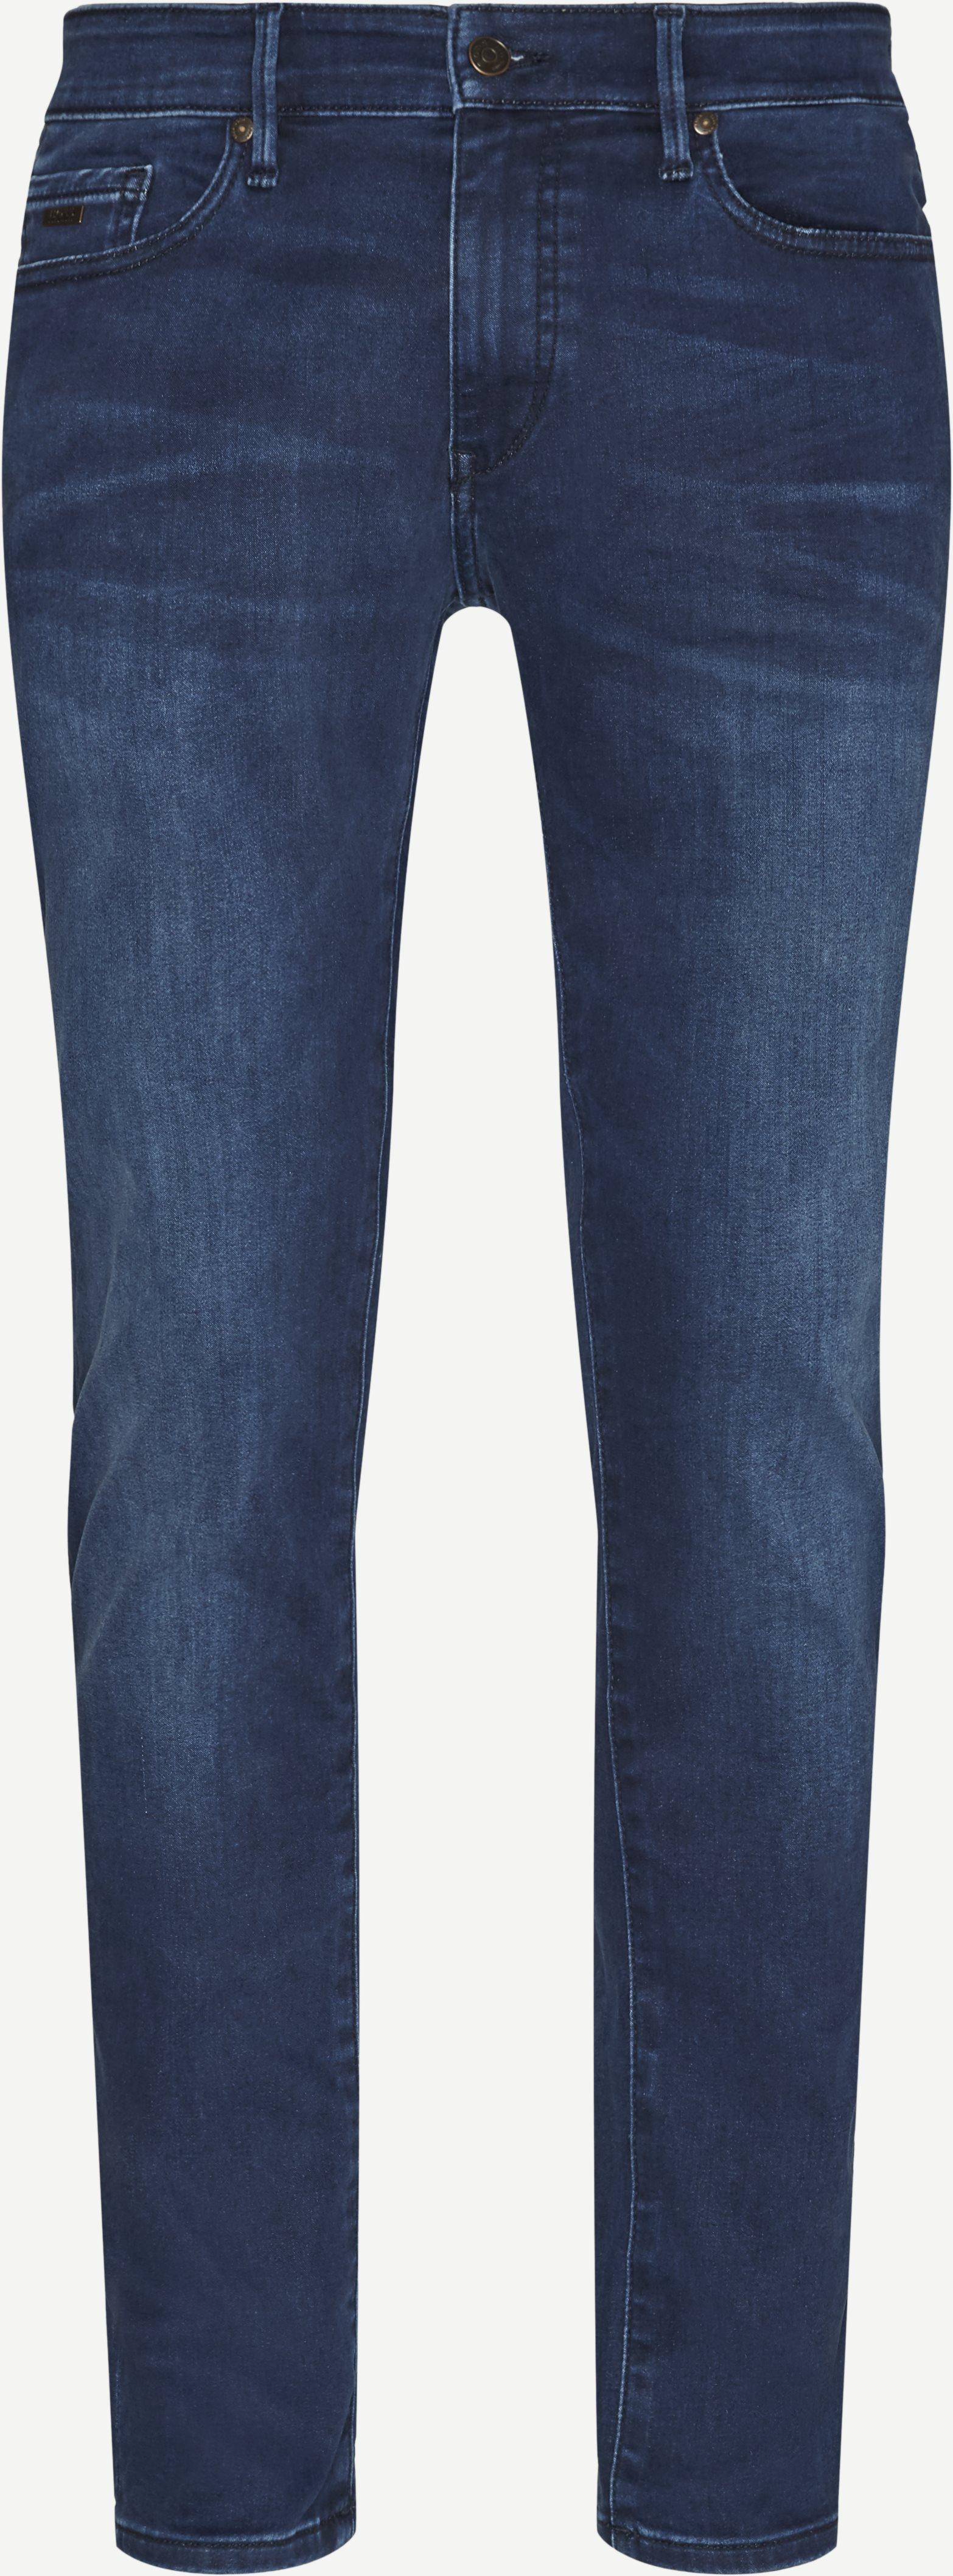 Jeans - Ekstra slim fit - Jeans-Blau